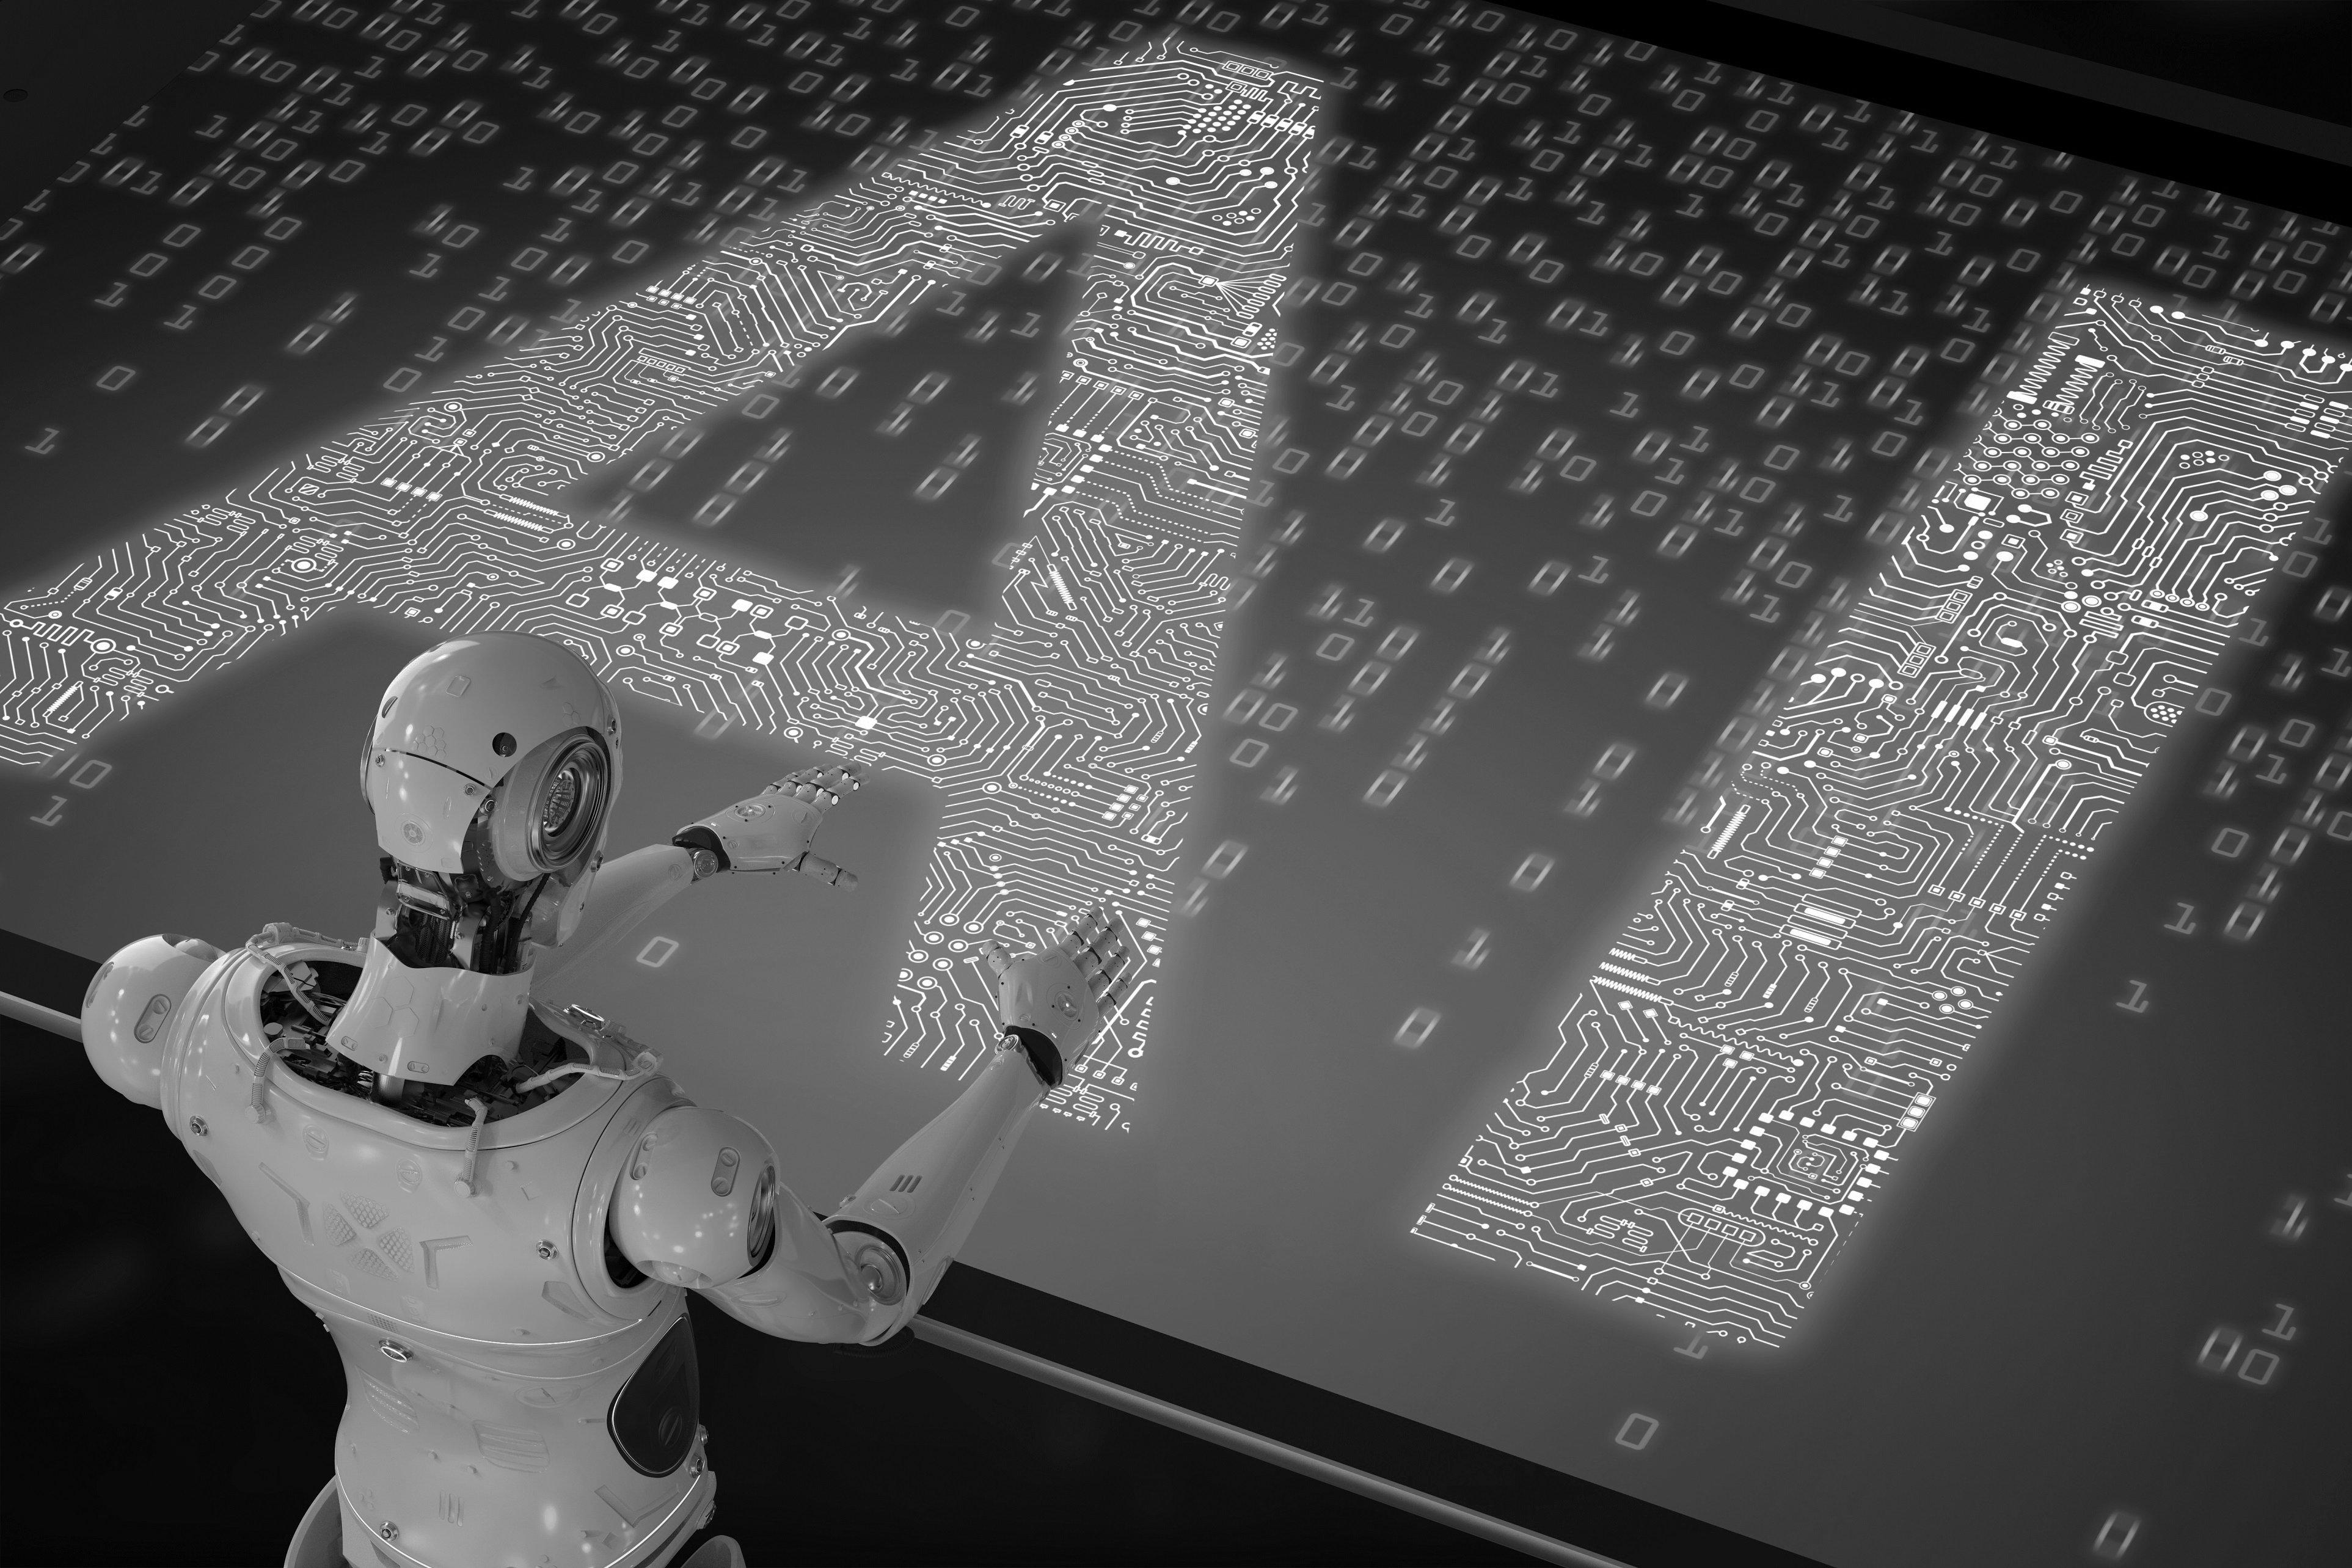 New AI tools_black and white